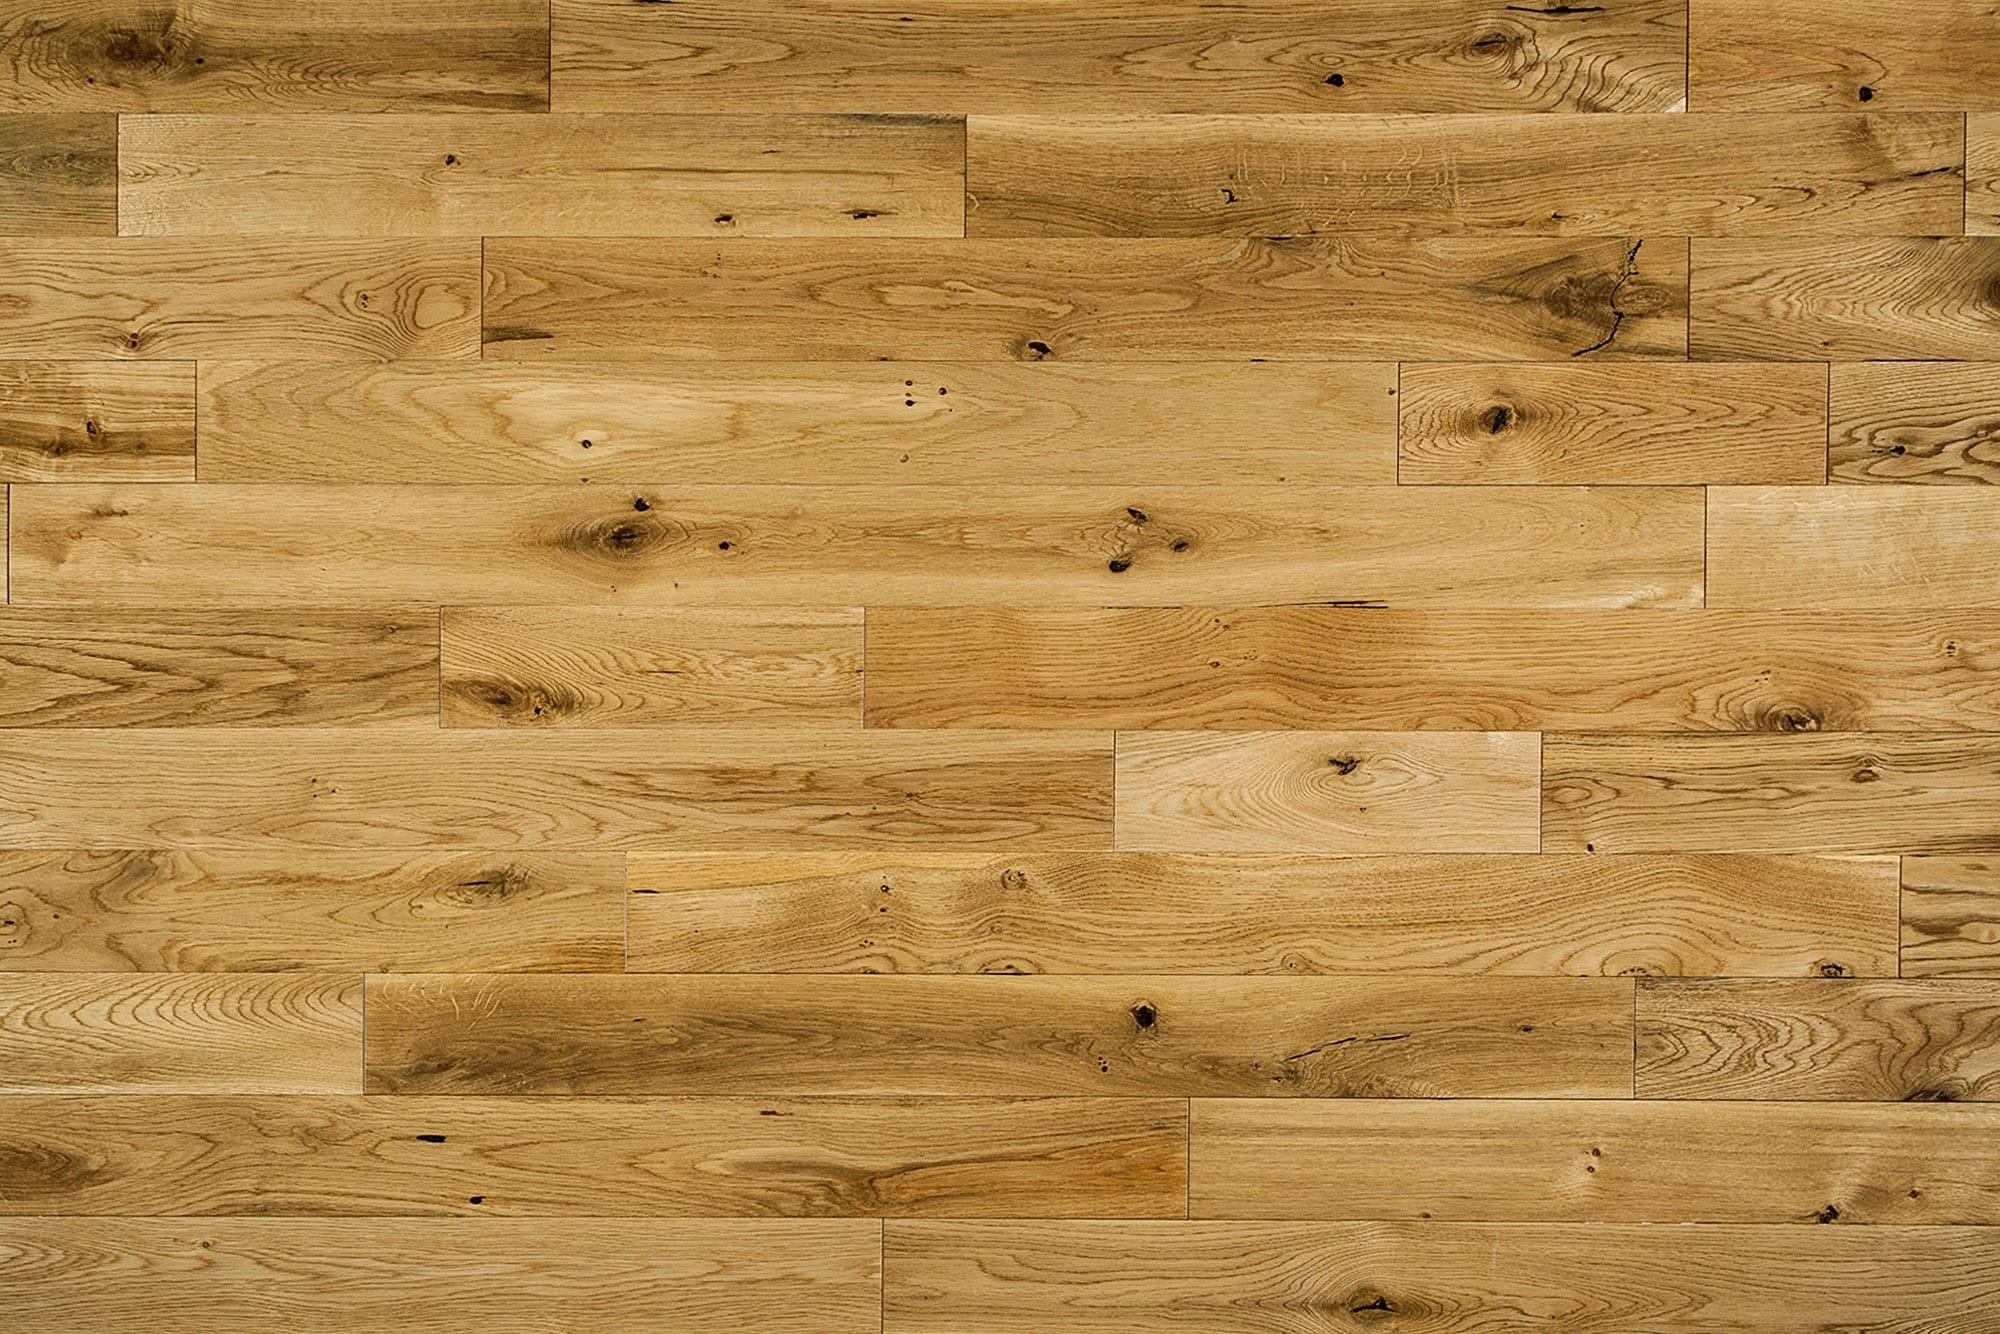 ... Blc Hardwood Flooring Application By Jasper Hardwood Flooring Maison  French Oak Natural French Oak ...